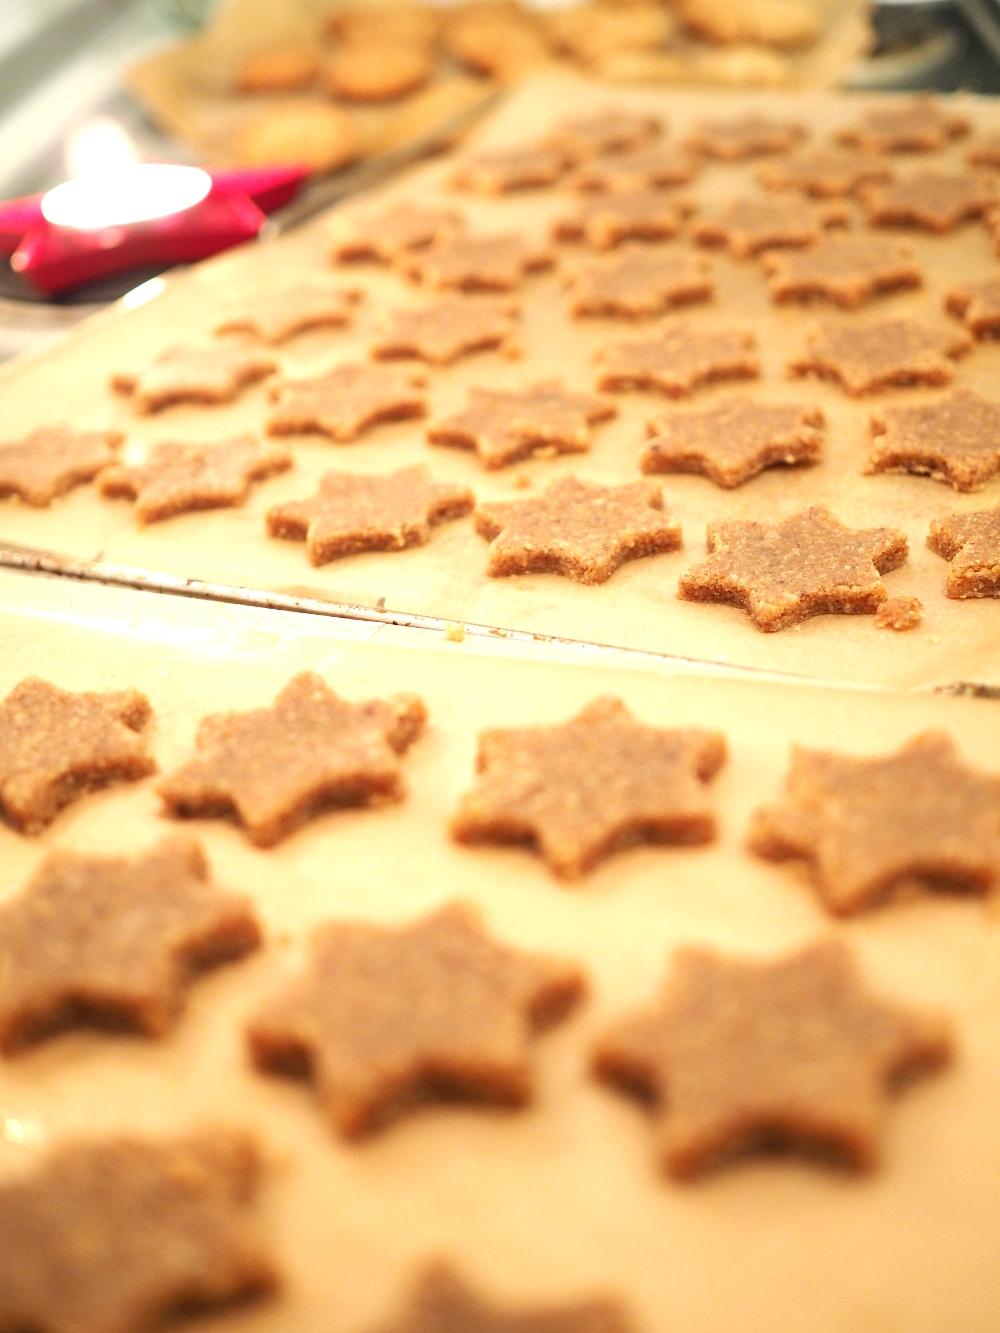 Vegan Cookies vegane plätzchen zimtsterne cinnamon stars vegetarian cake christmas cookies peanut cookies wehnachtsstimmung rezept otto.de #weihnachtenistindir